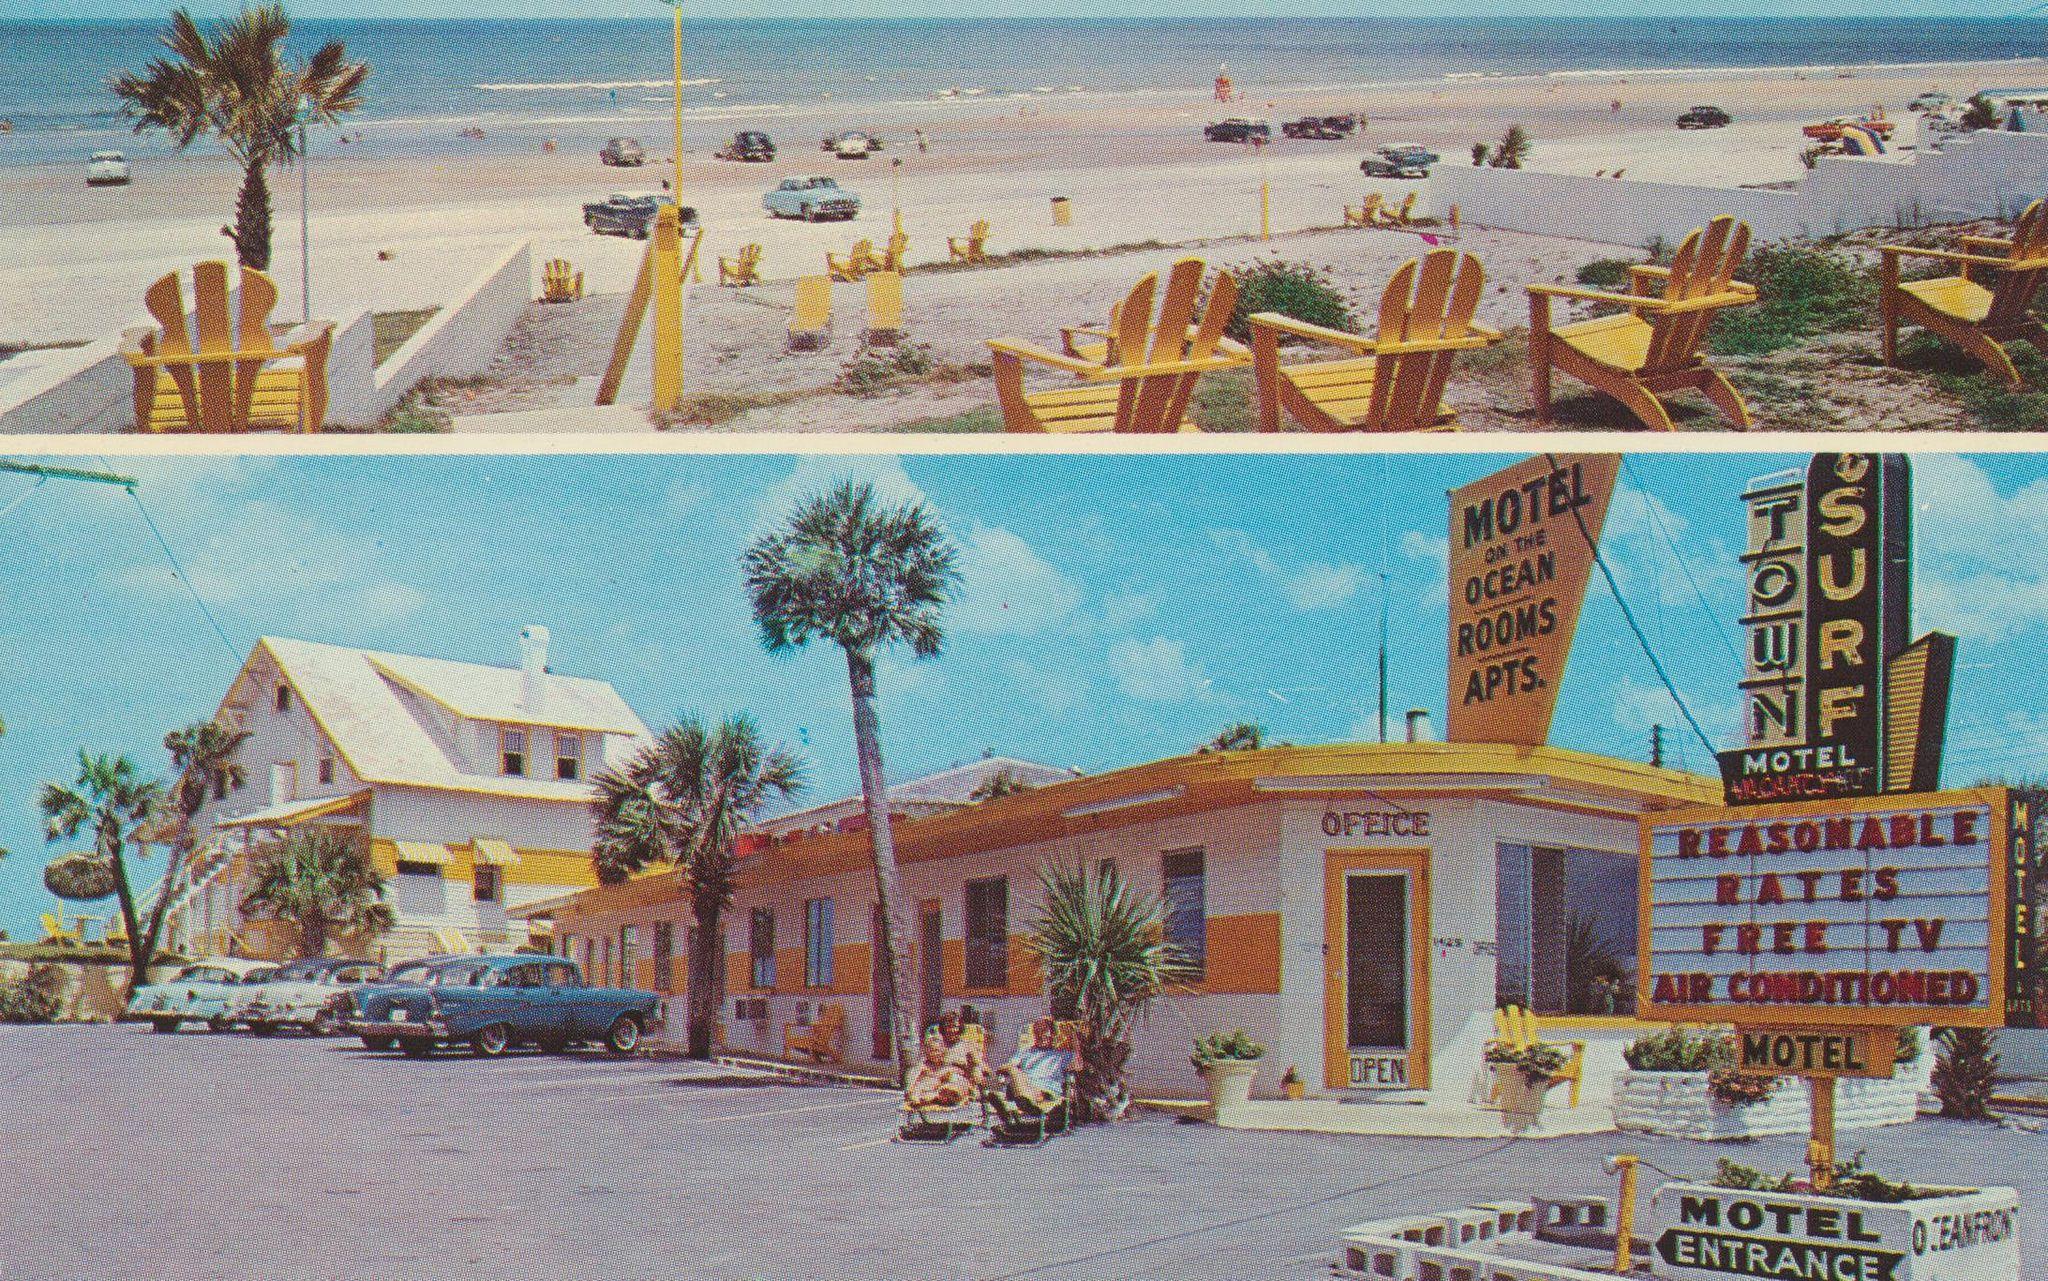 Town Surf Daytona Beach Florida Daytona Beach Florida Daytona Beach Famous Beaches